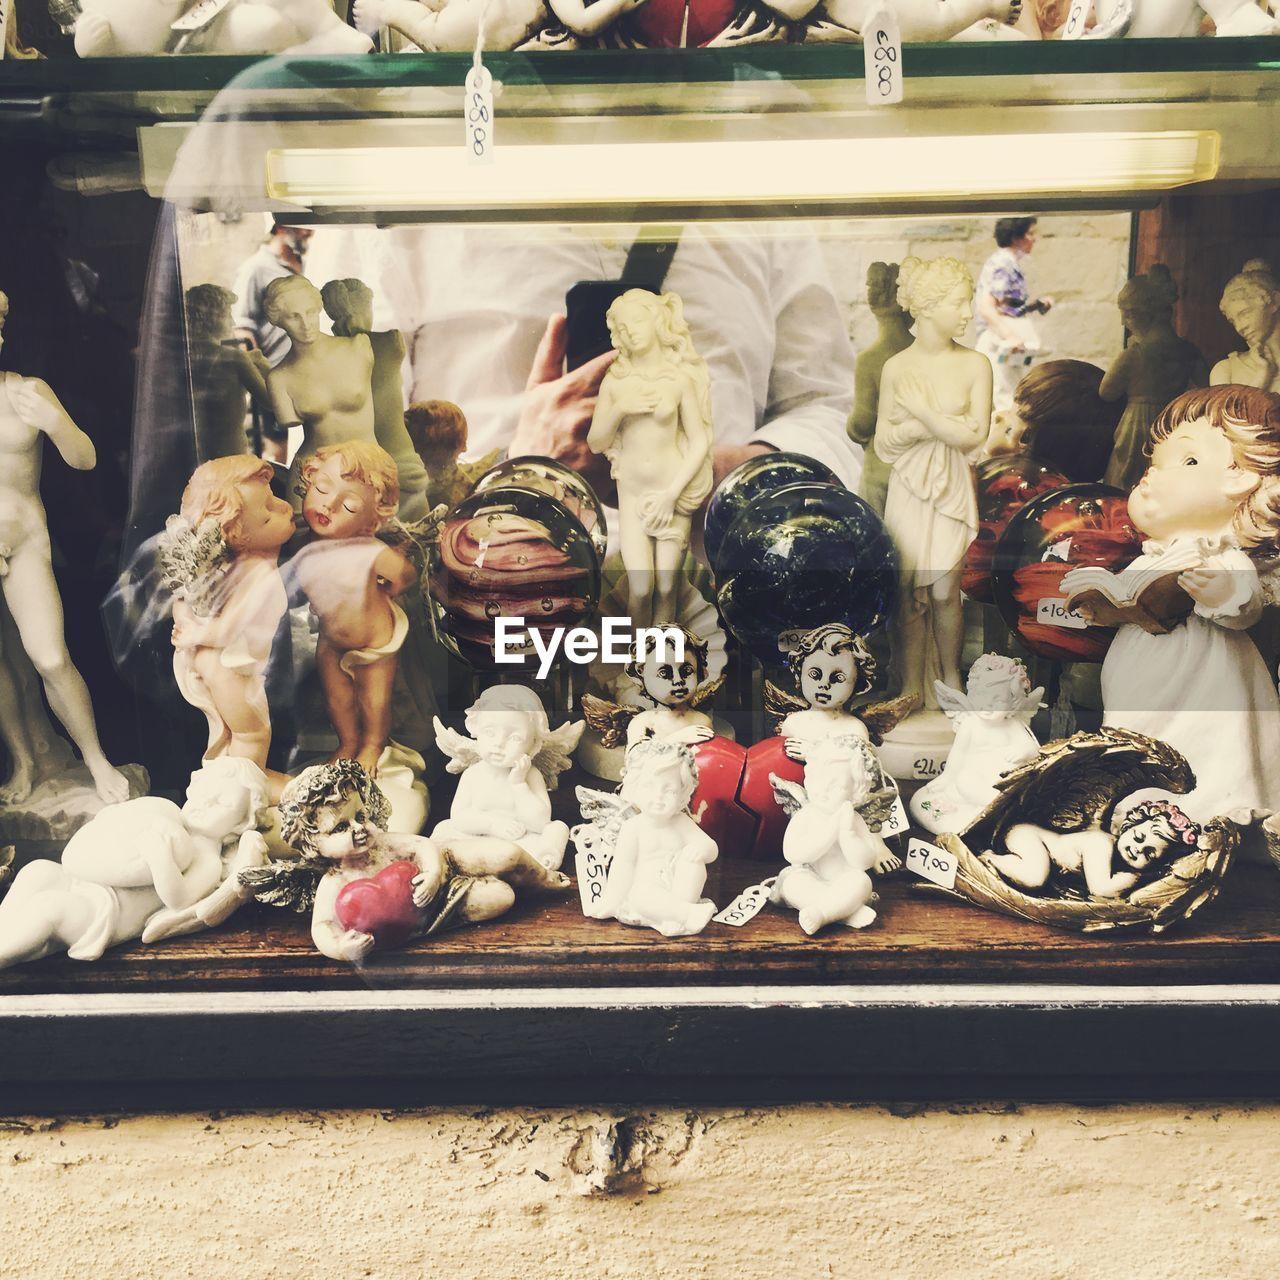 Figurines On Window Display Of Store